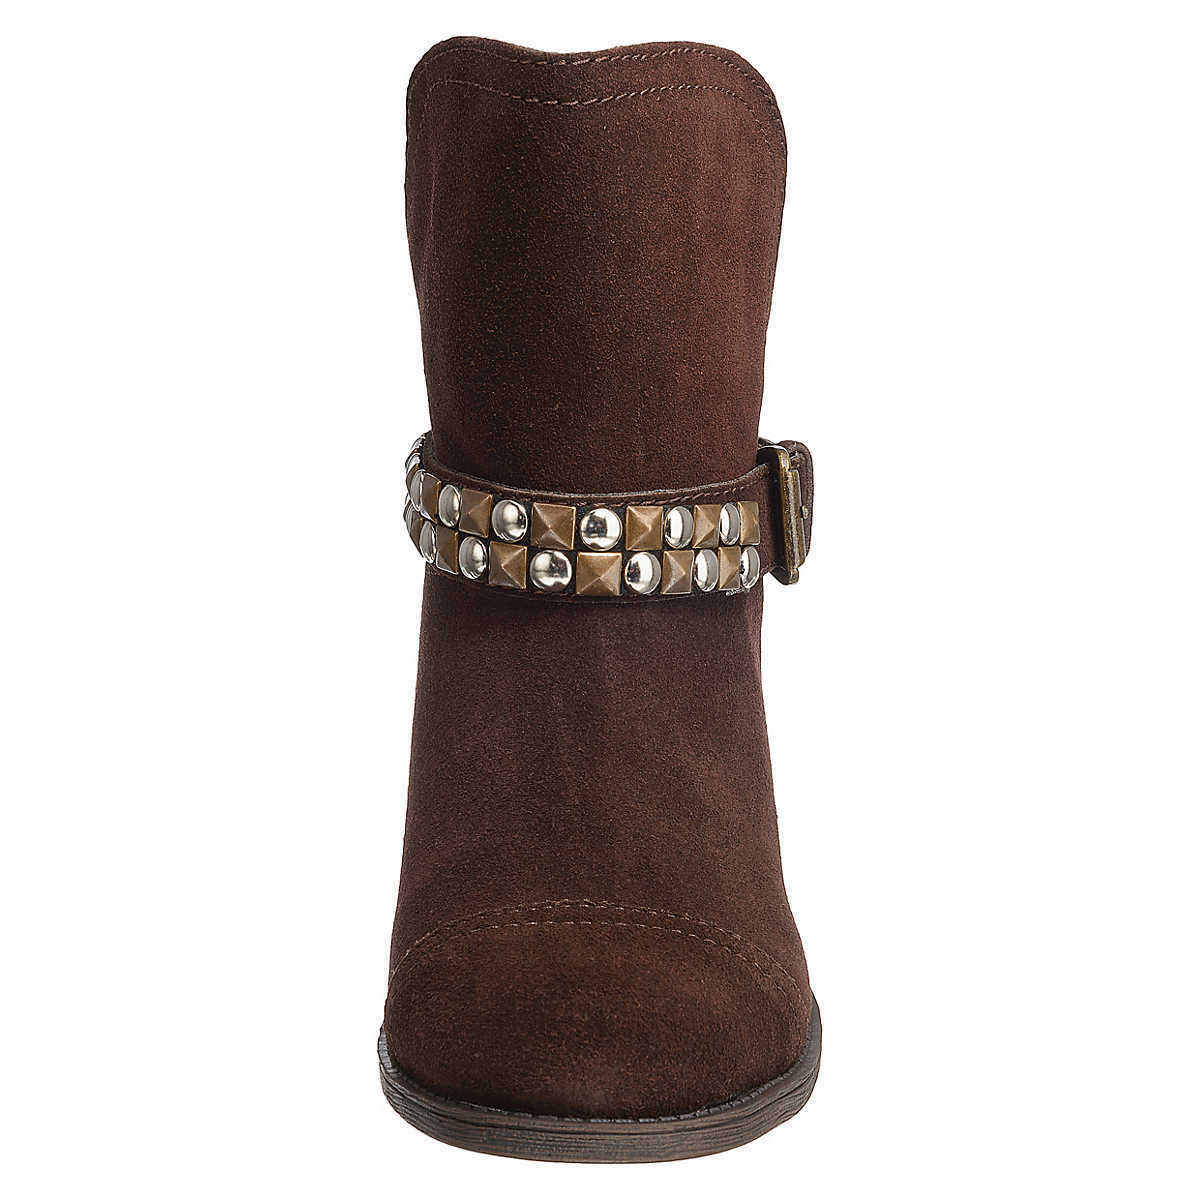 ROCKET DOG® Shine Damenschuhe 39, Stiefeletten Stiefel Stiefel braun, Gr. 39, Damenschuhe Neu 25f9e0